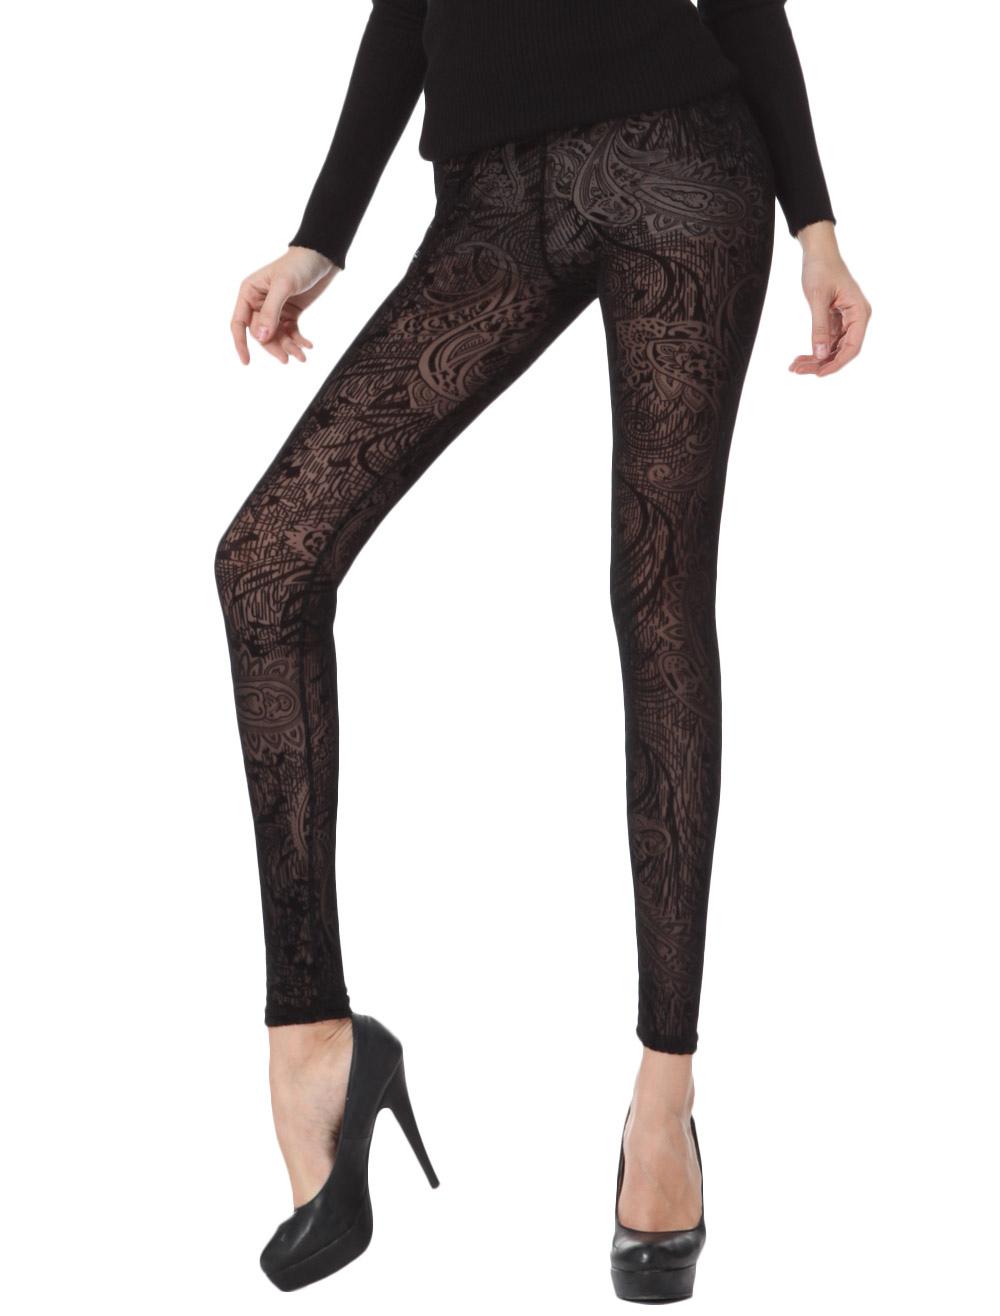 Vintage Black Lace Jacquard Shaping Leggings For Women